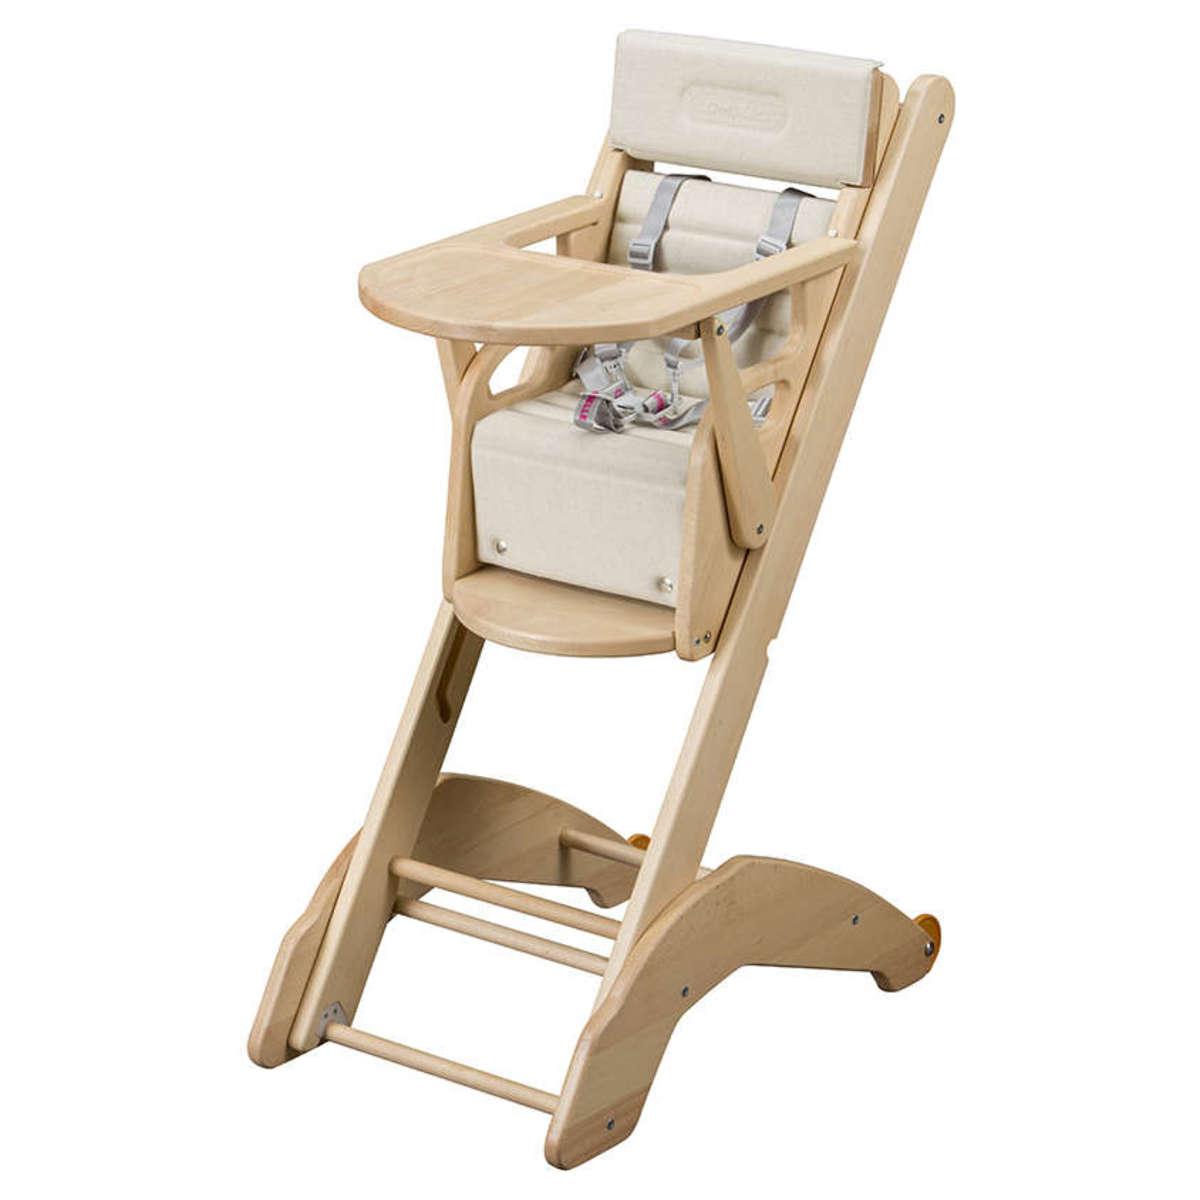 Chaise haute Chaise Haute Twenty One Evo - Naturel Chaise Haute Twenty One Evo - Naturel